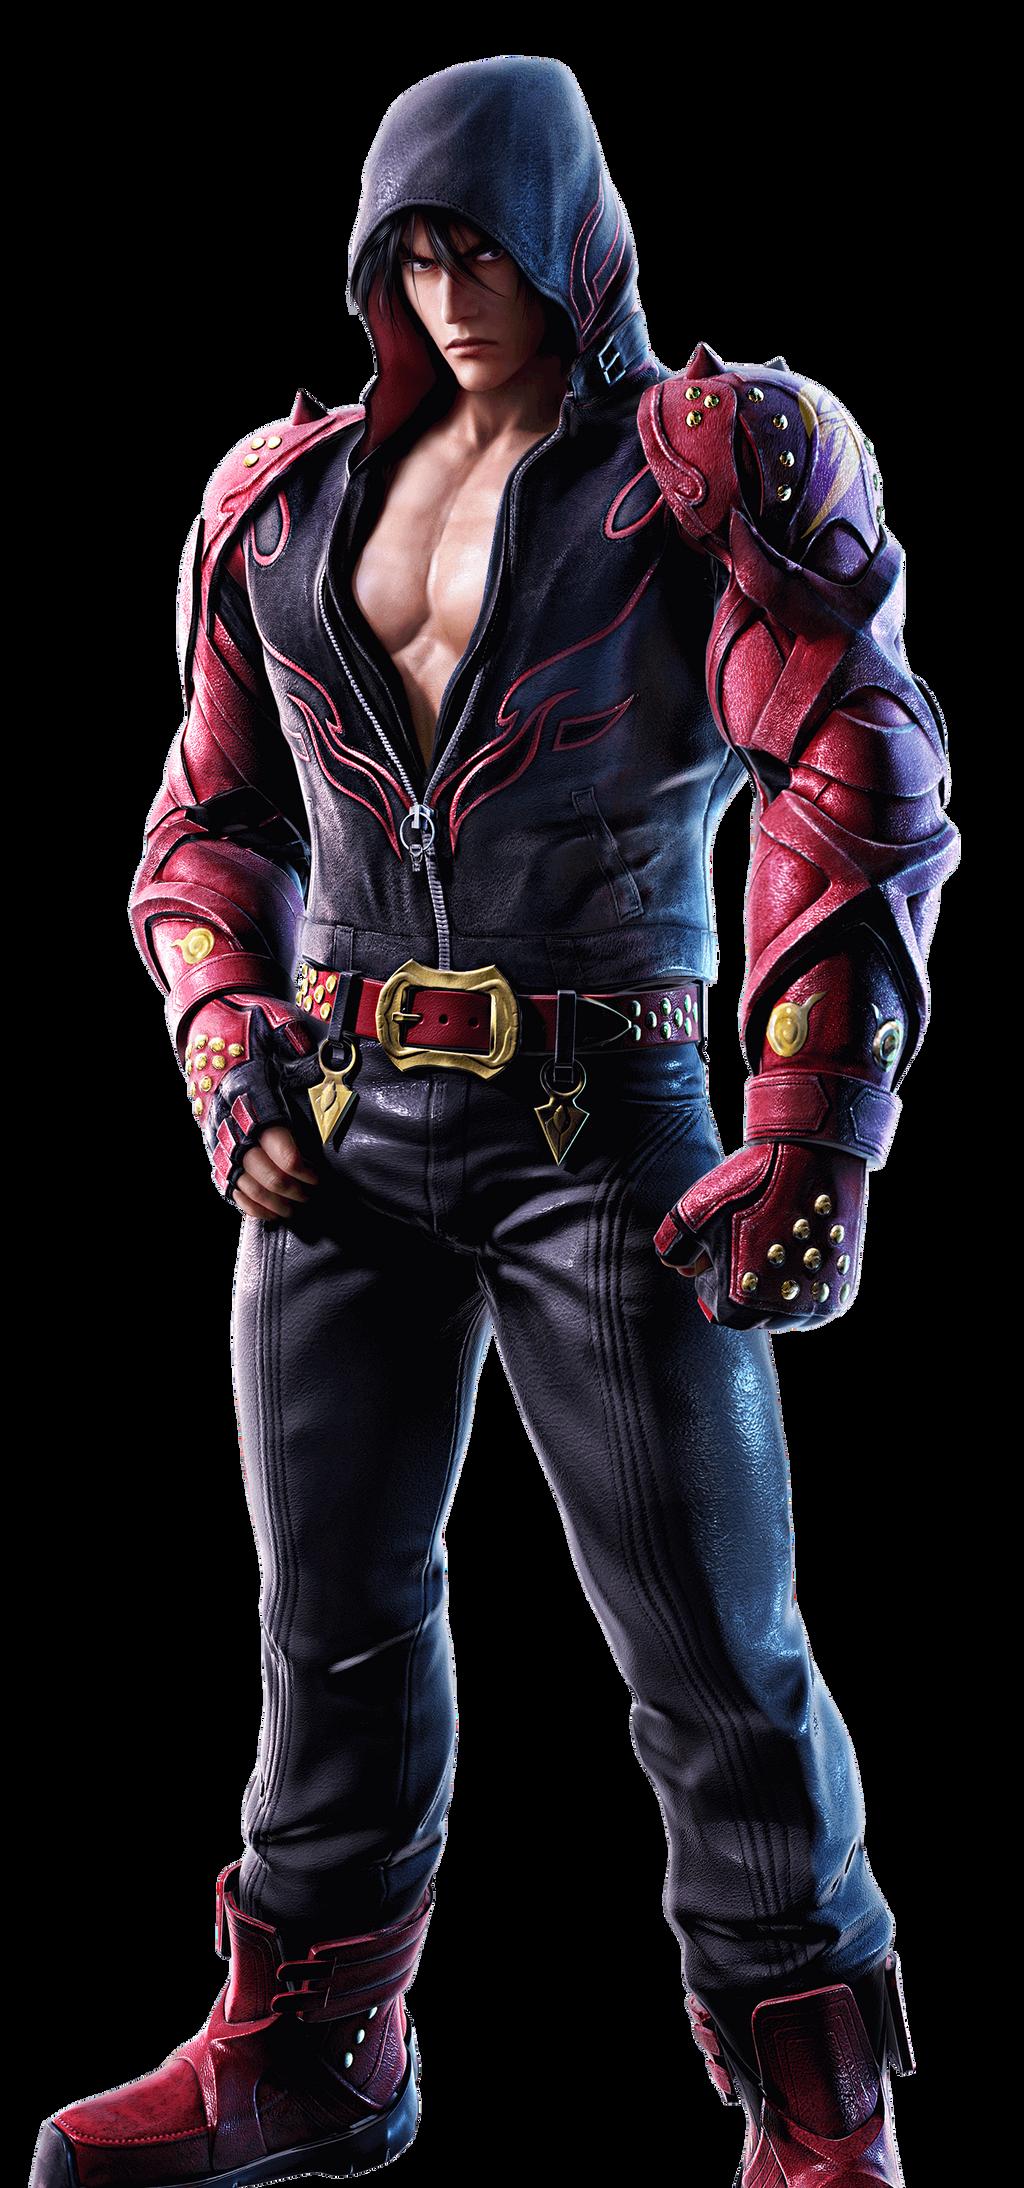 Jin Tekken 7 Render By Yukizm On Deviantart